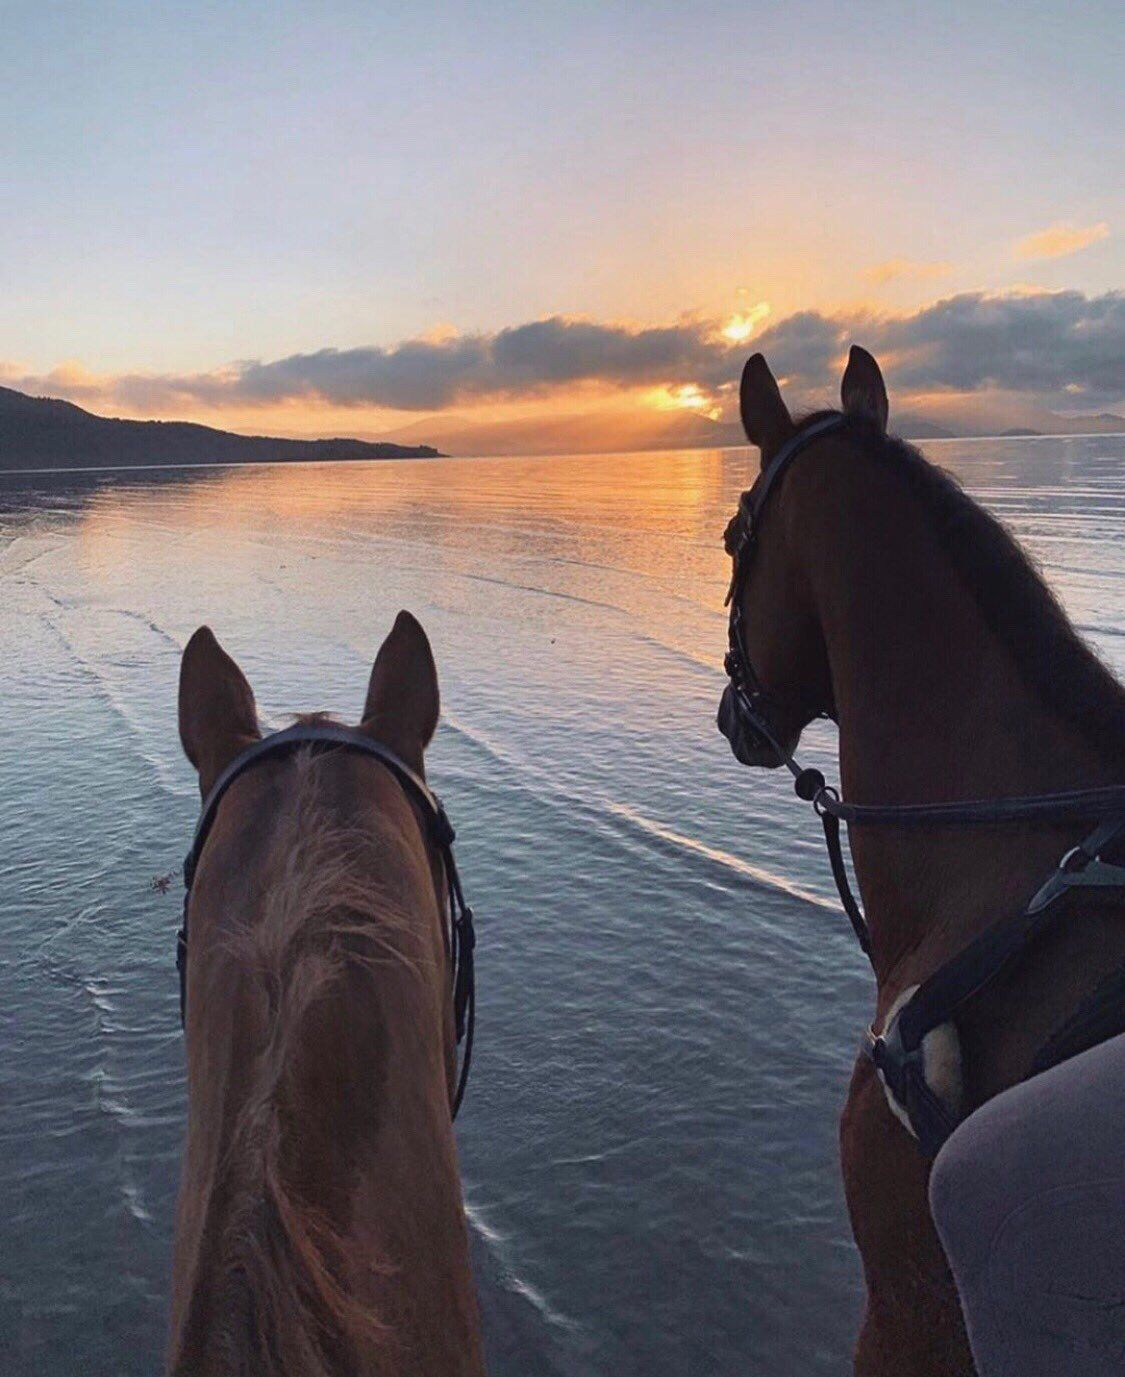 Á´Š Á´€á´…ɪᴏʀ On En 2020 Photographie Equestre Passion Cheval Jolis Chevaux